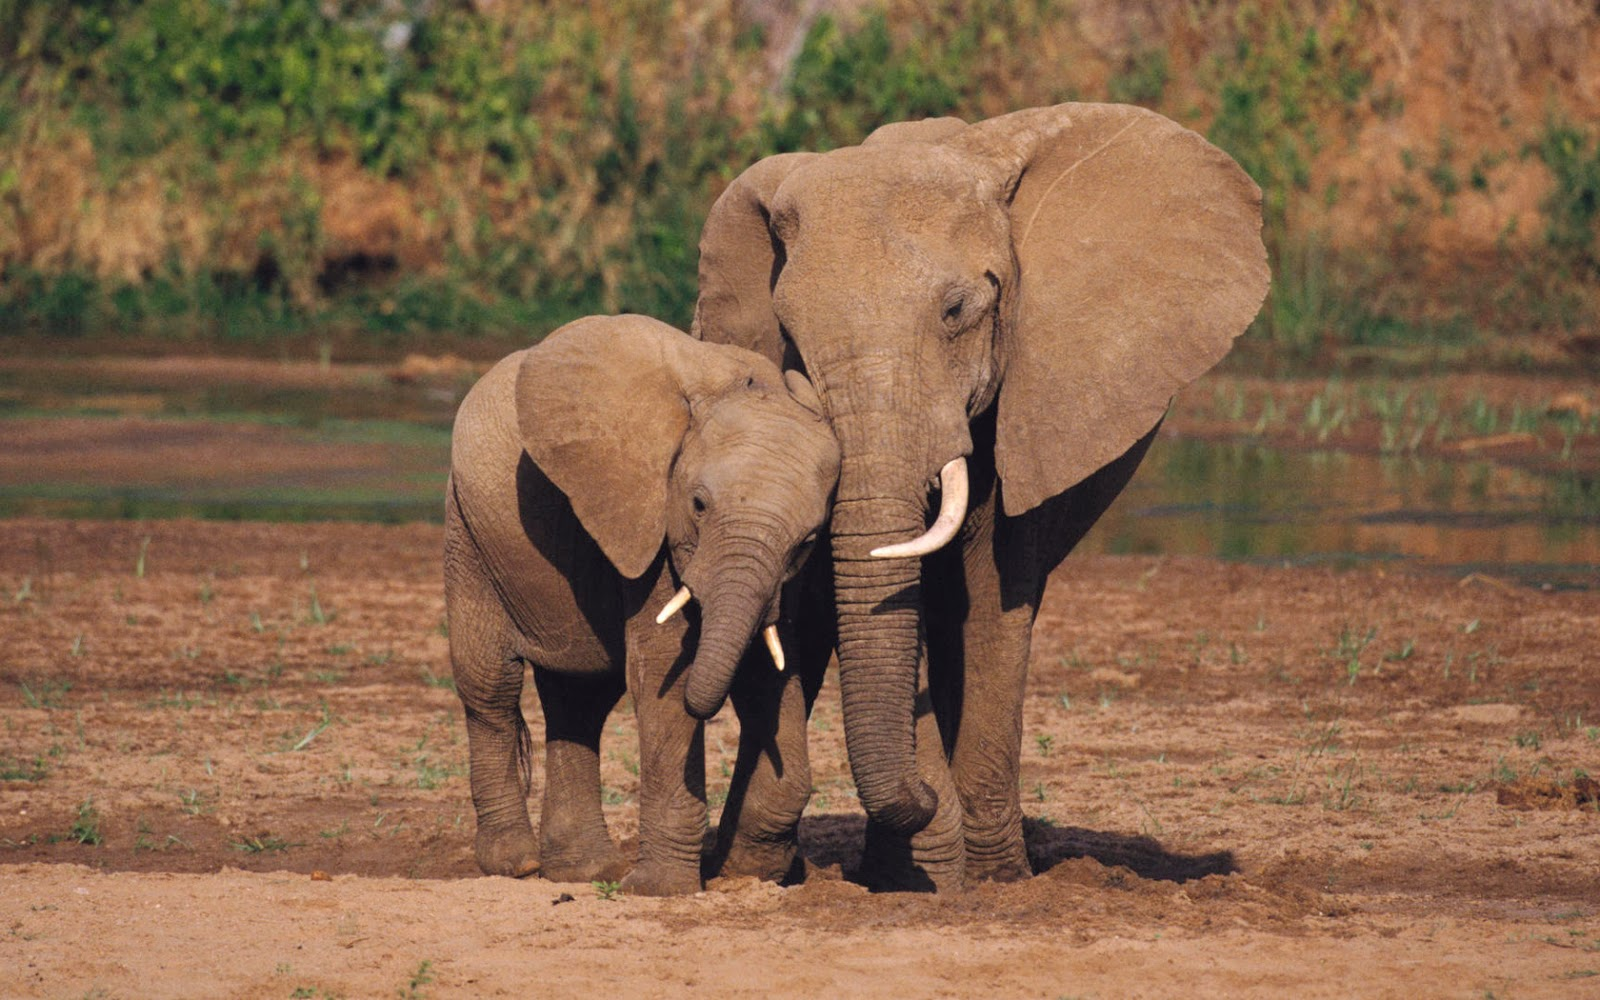 Elefante tierno imagenes - Imagui